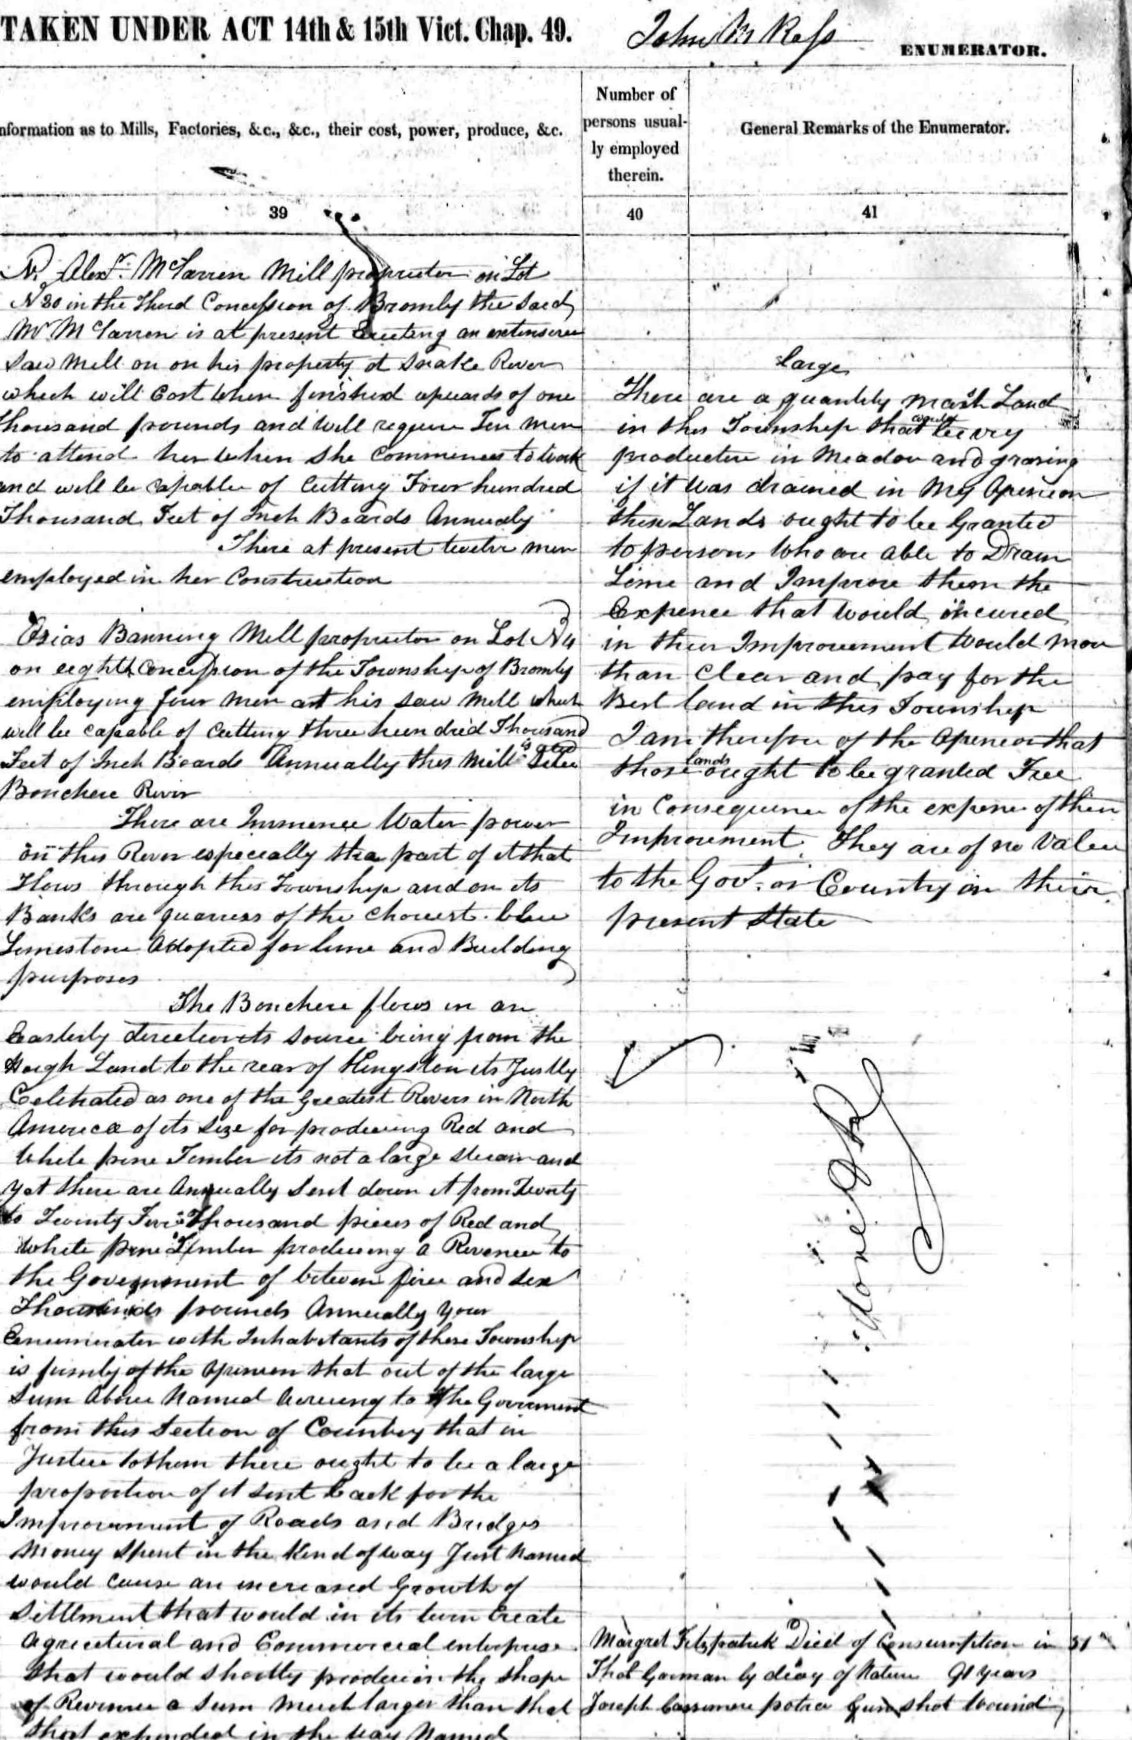 Part of Bromley Census, 1851, Ontario, Canada